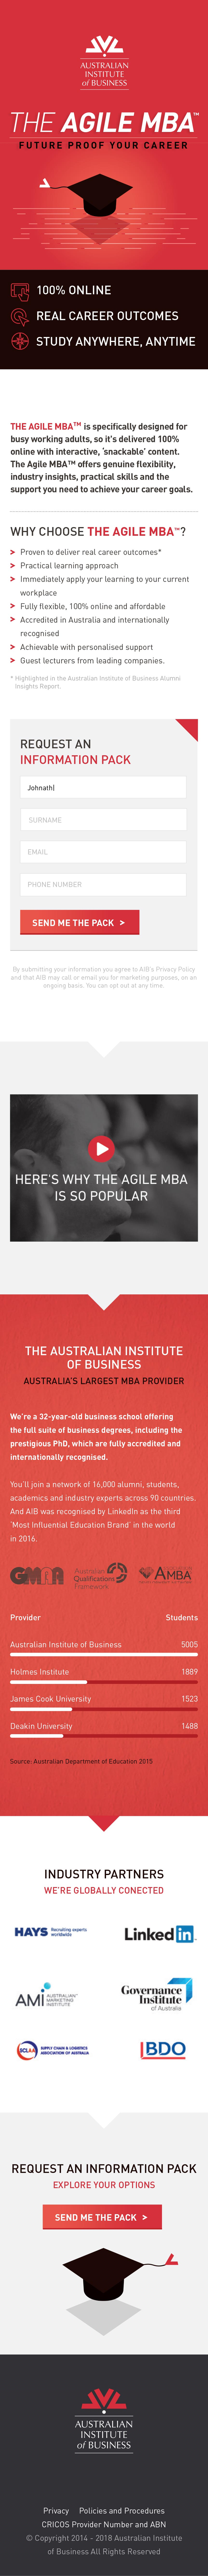 AIB-Agile-MBA-Mobile-Landing-Page.jpg